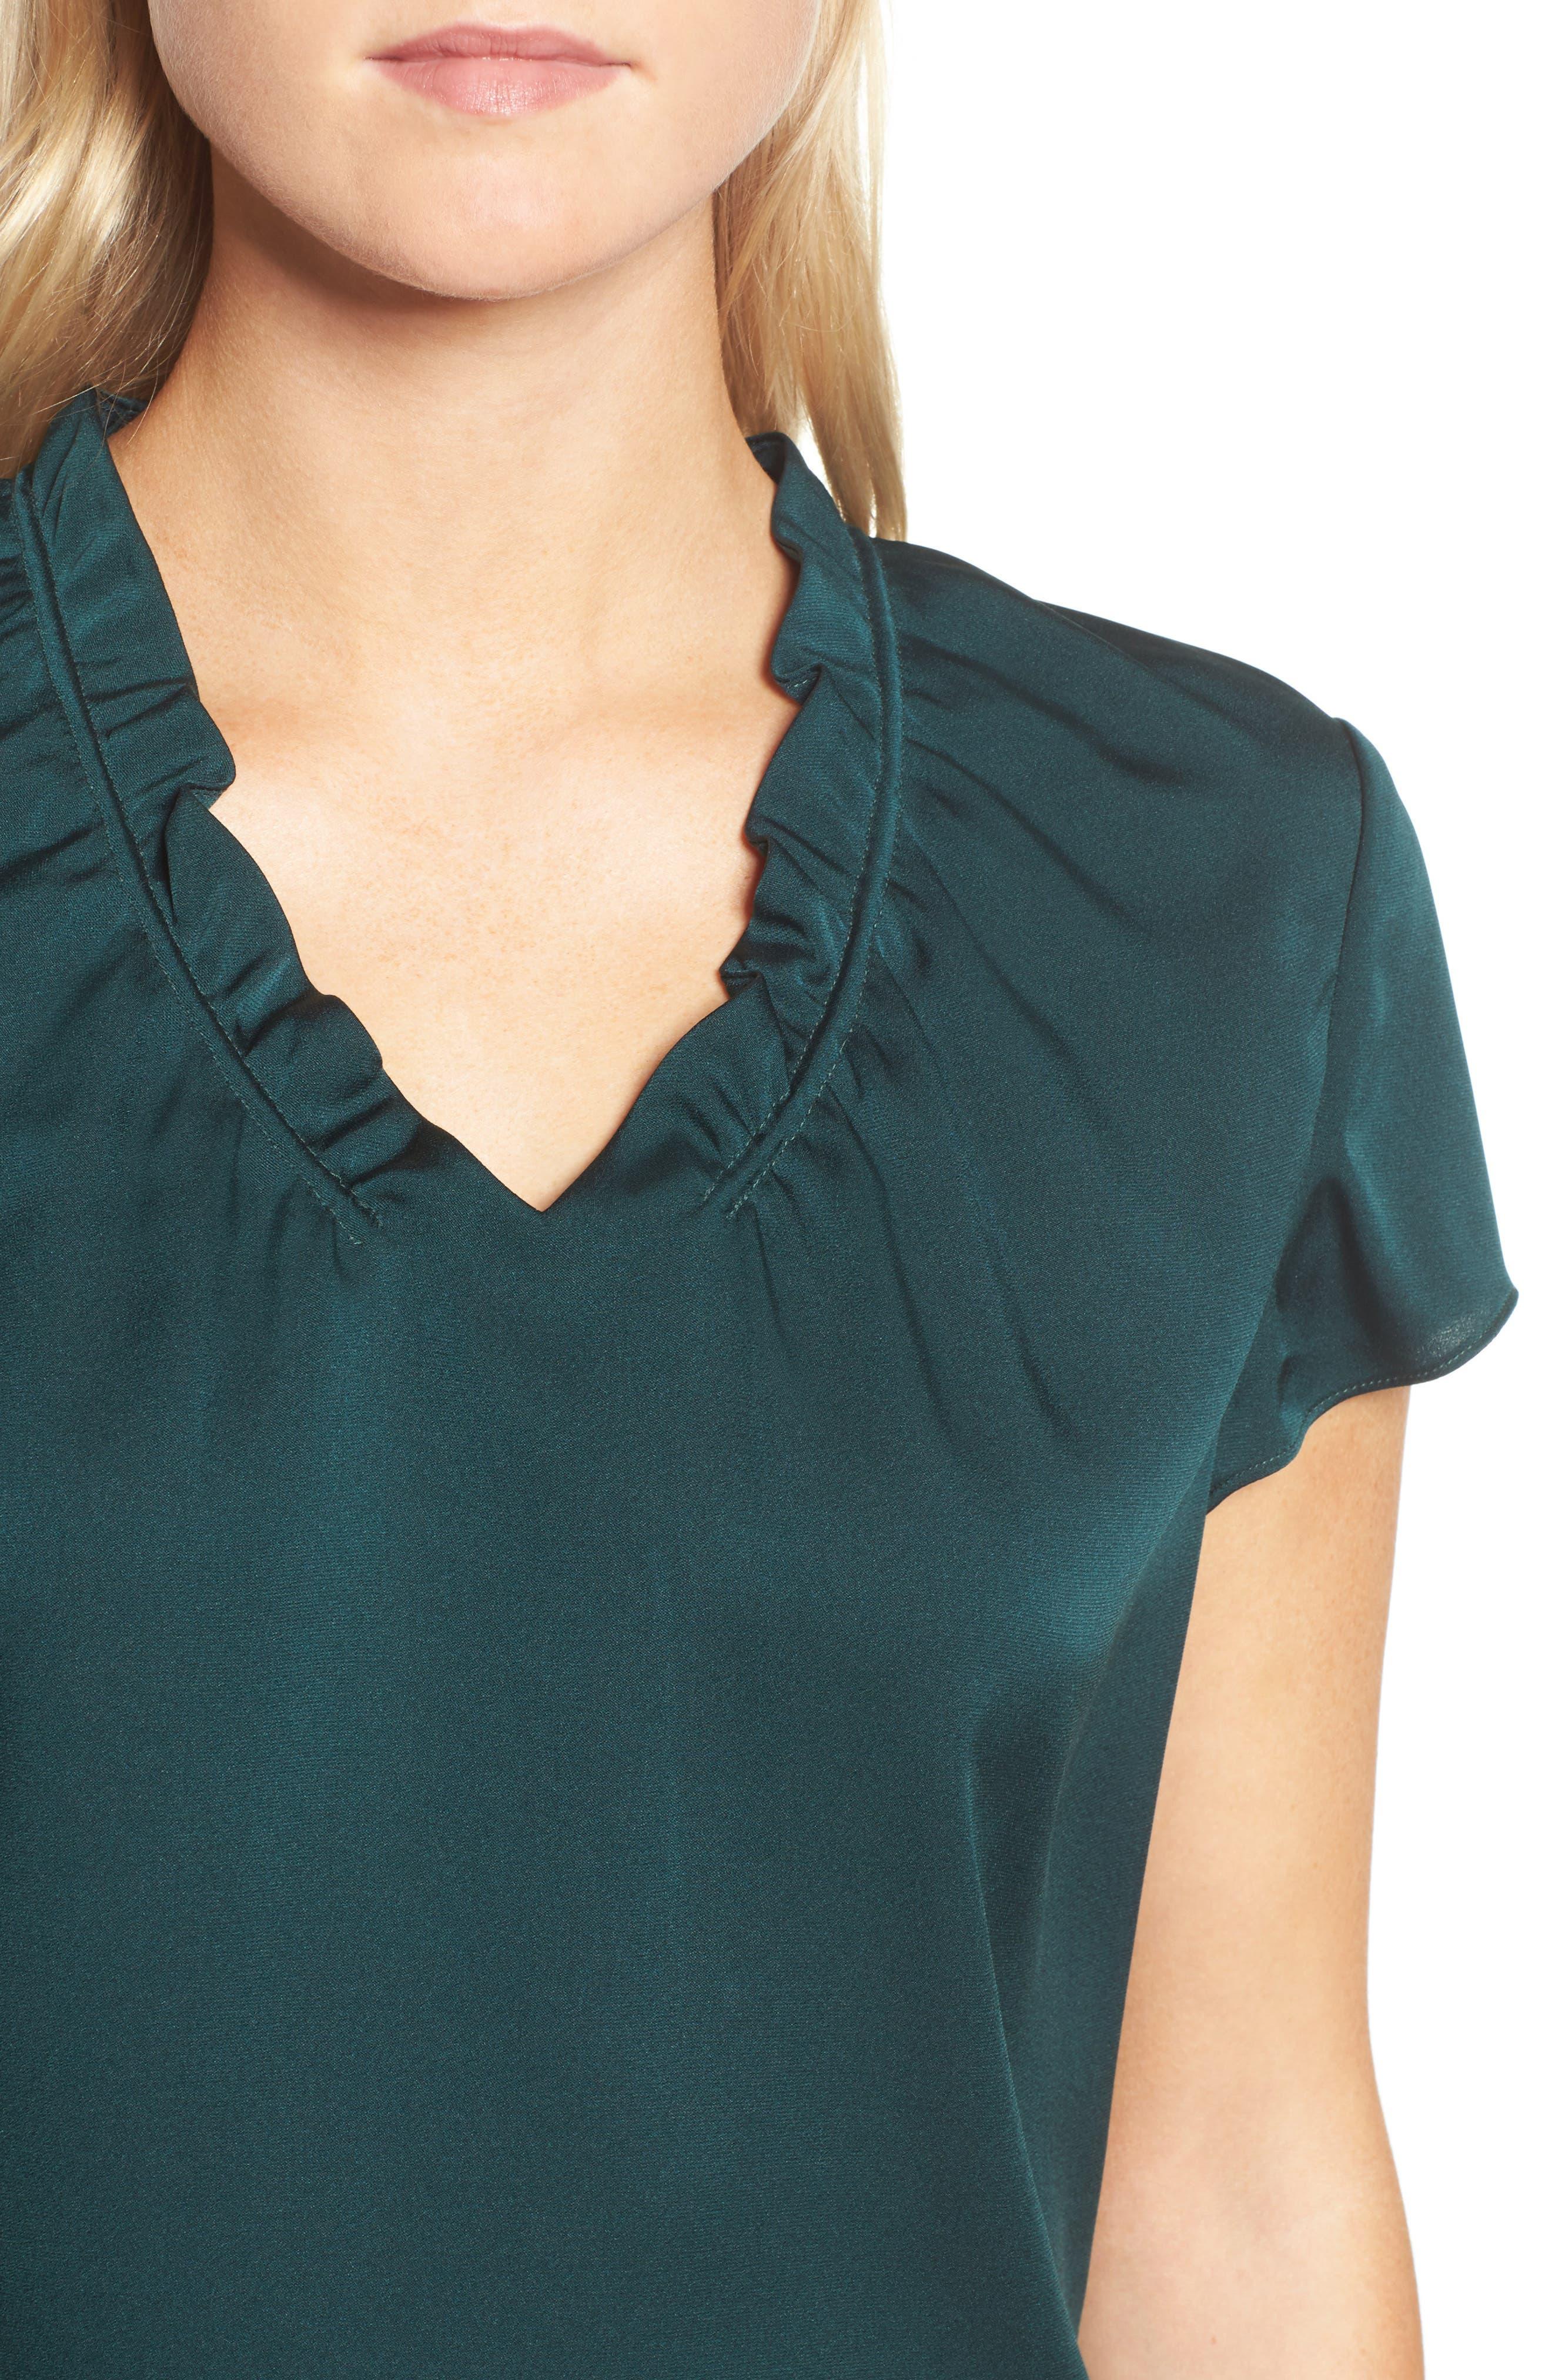 Isamara Stretch Silk Top,                             Alternate thumbnail 4, color,                             Peacock Green